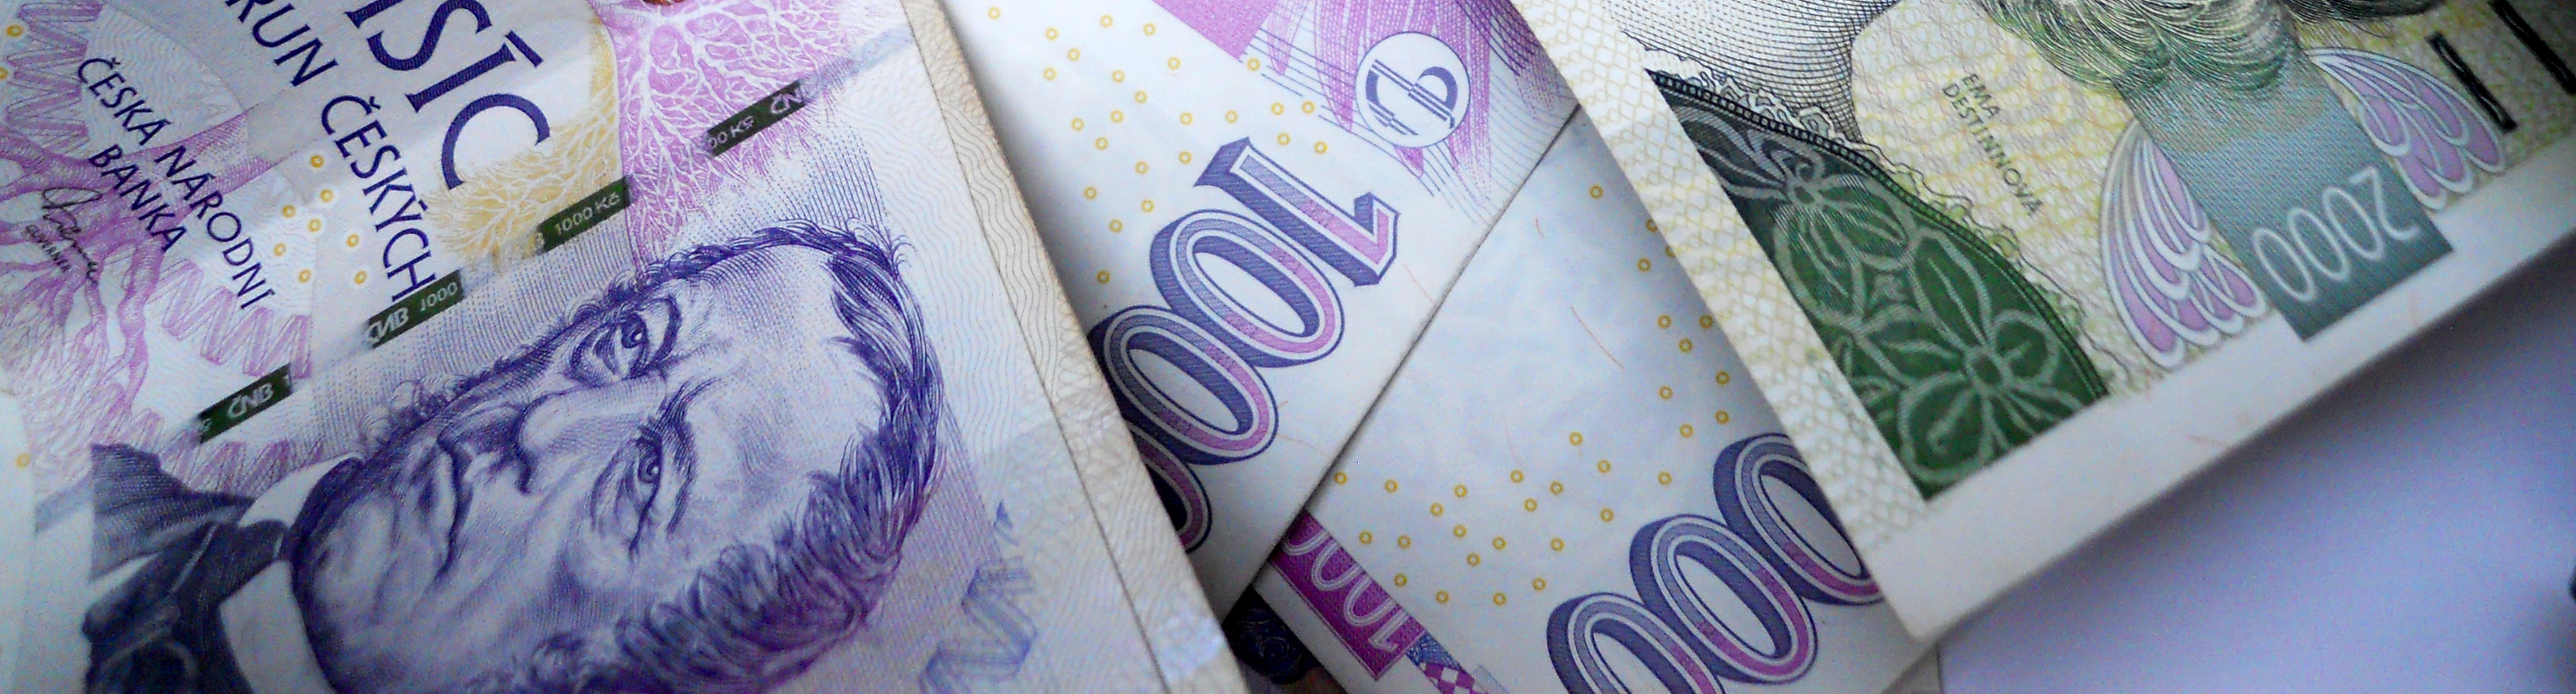 Nebankovni pujcky do 3000 vyplaceni v hotovosti teplice